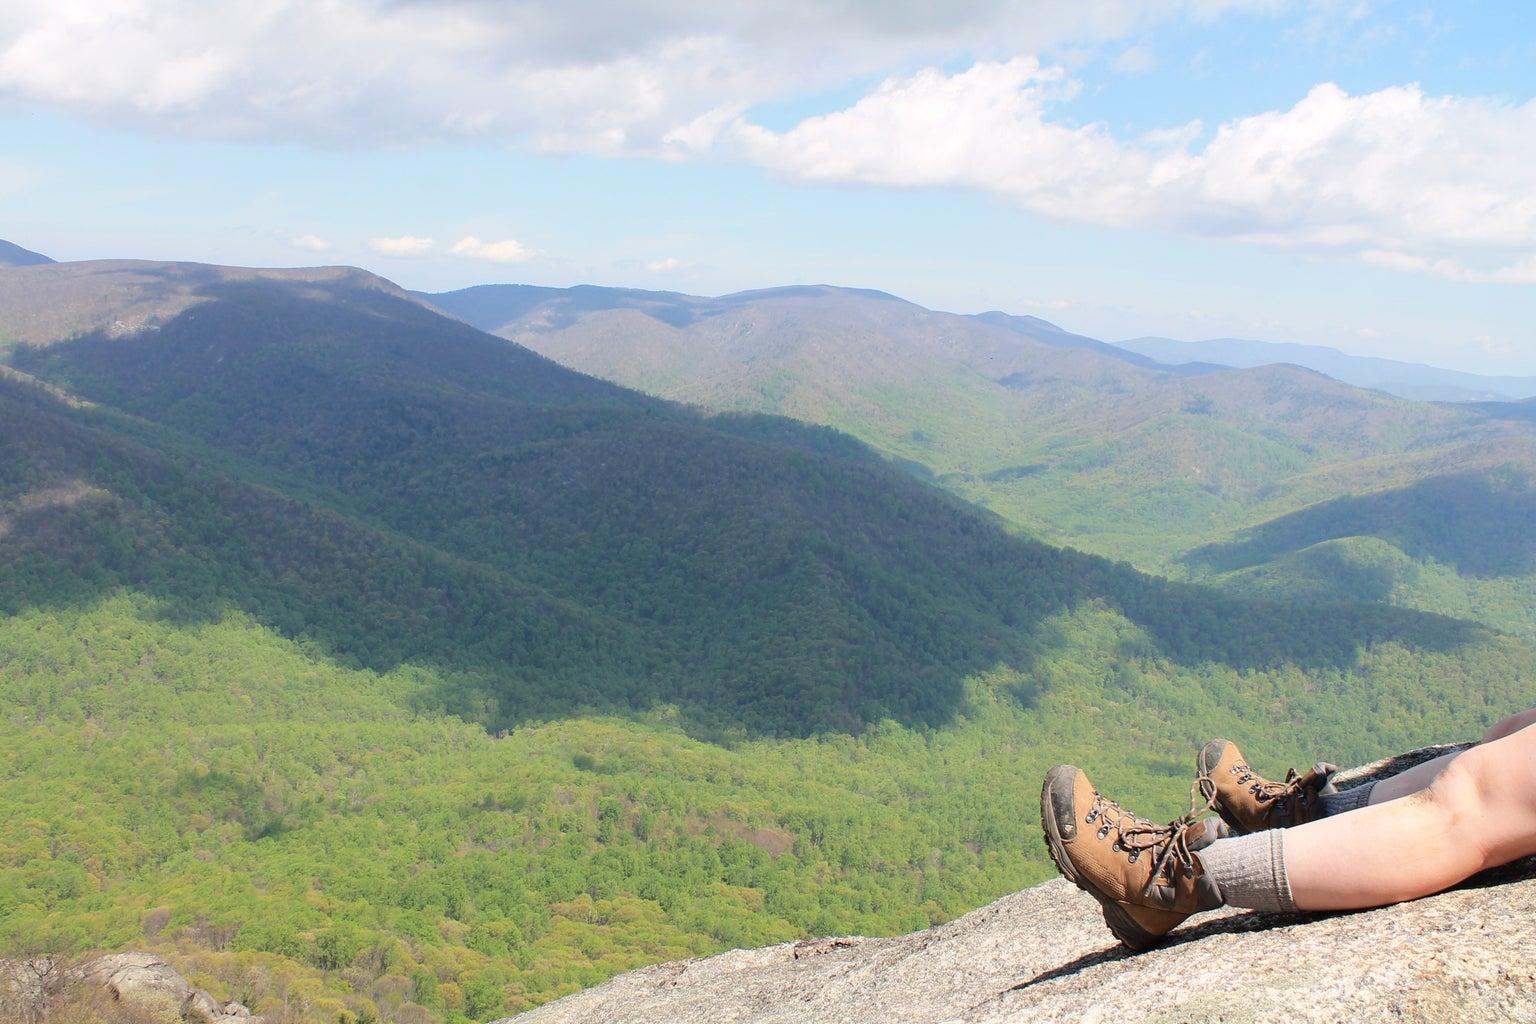 Hiking Shoes Boots Mountains View Adventure Climb Fun Original